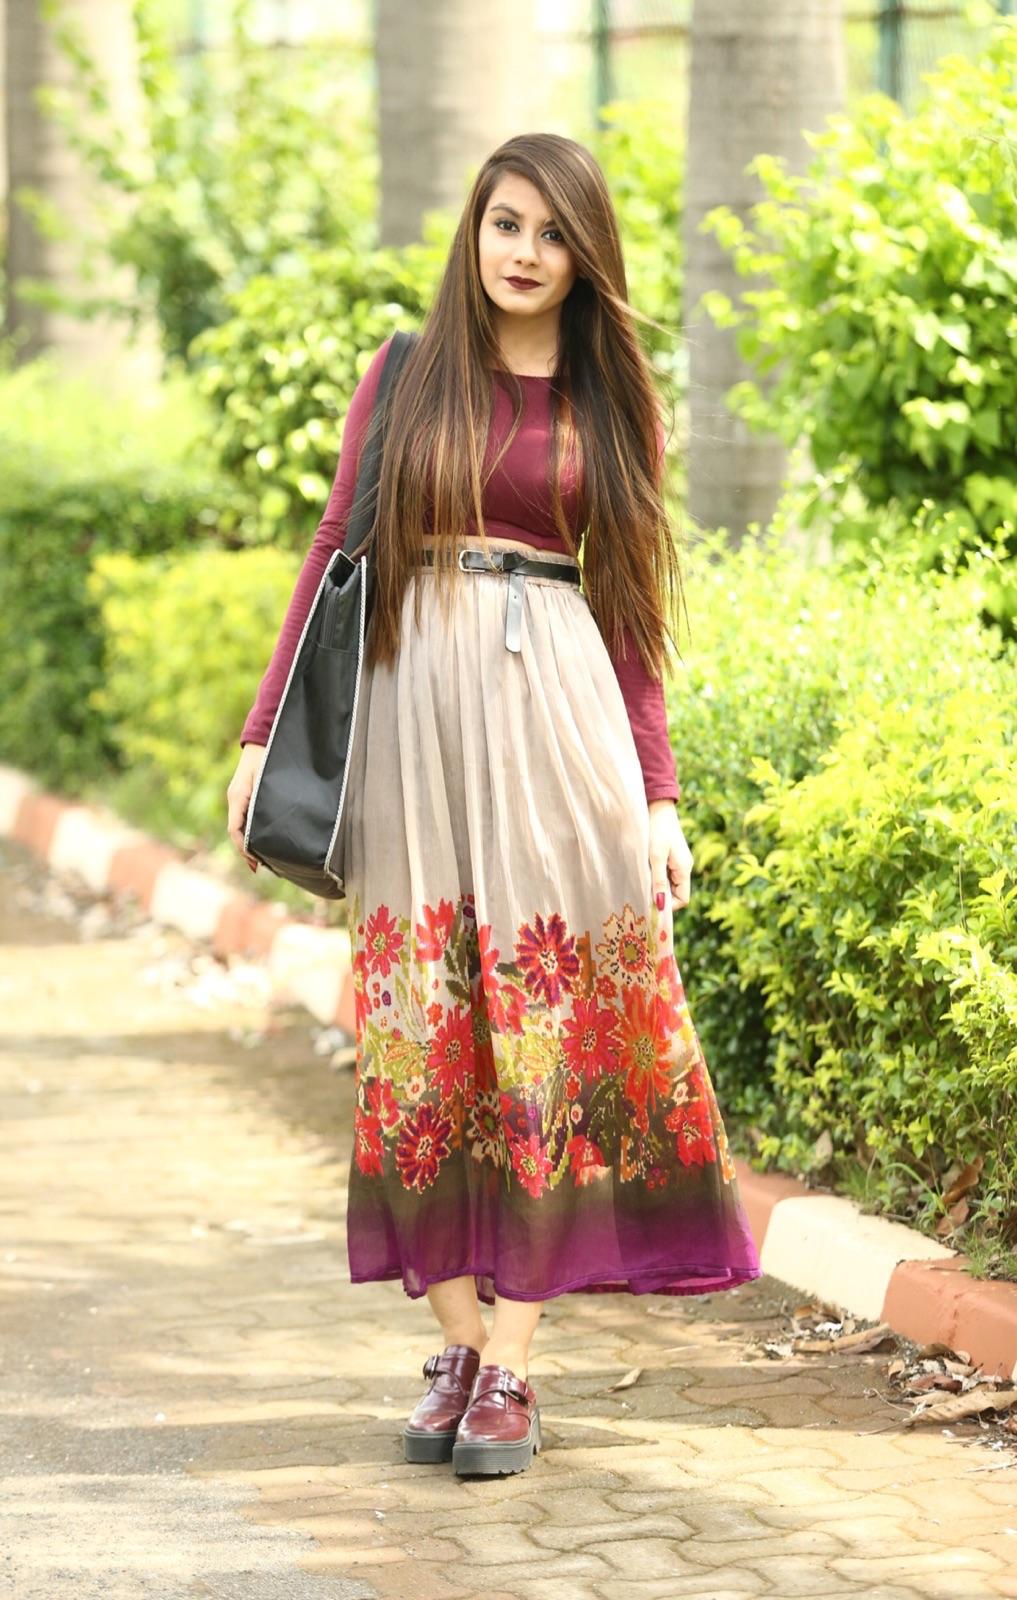 Samidha singh clicked by Dishant Kacha